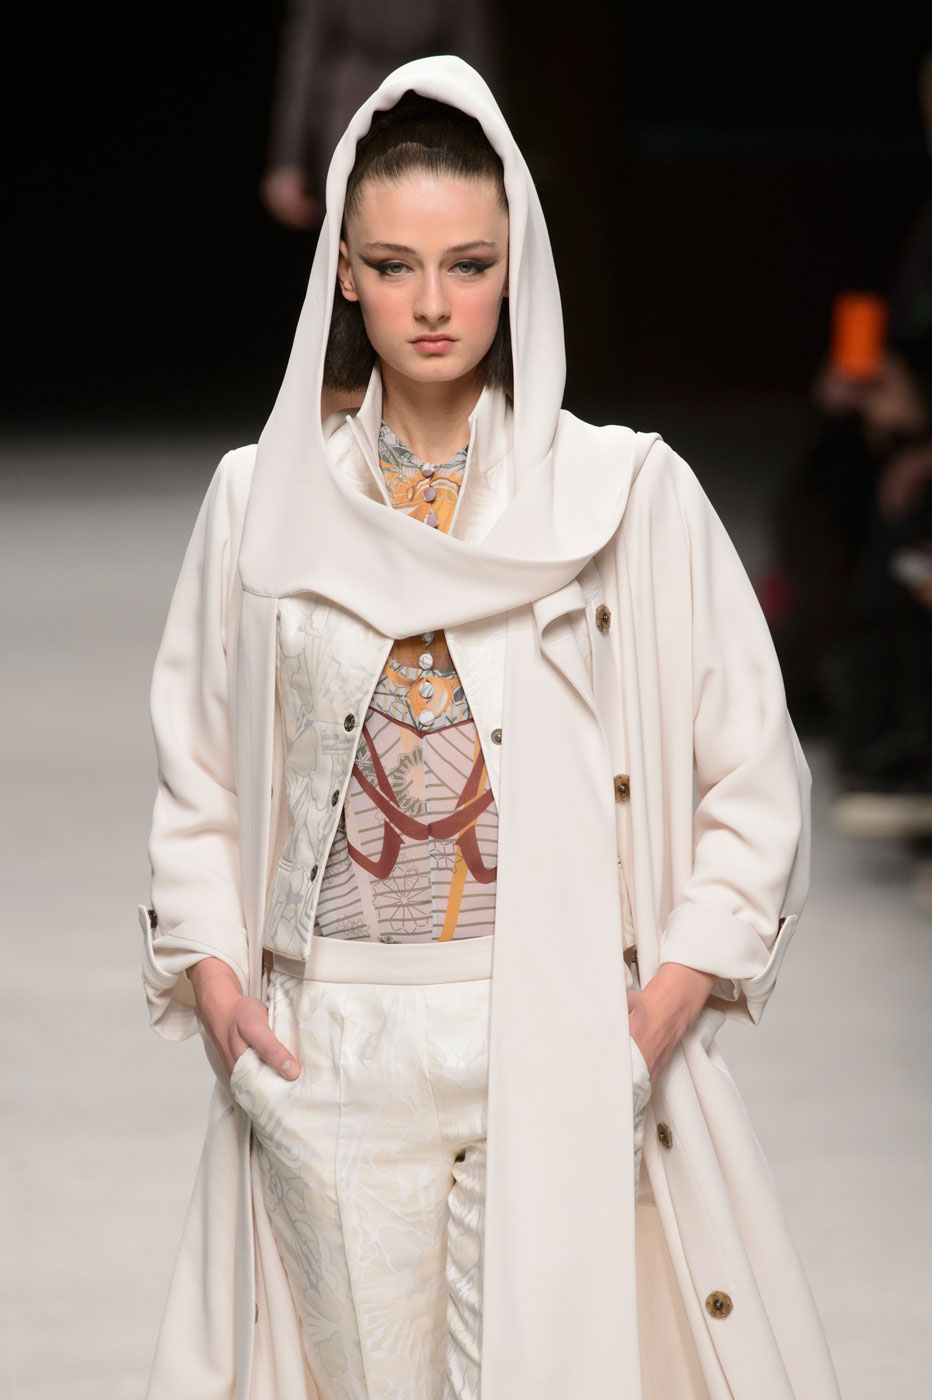 Julien-Fournie-Prive-fashion-runway-show-haute-couture-paris-spring-2015-the-impression-21